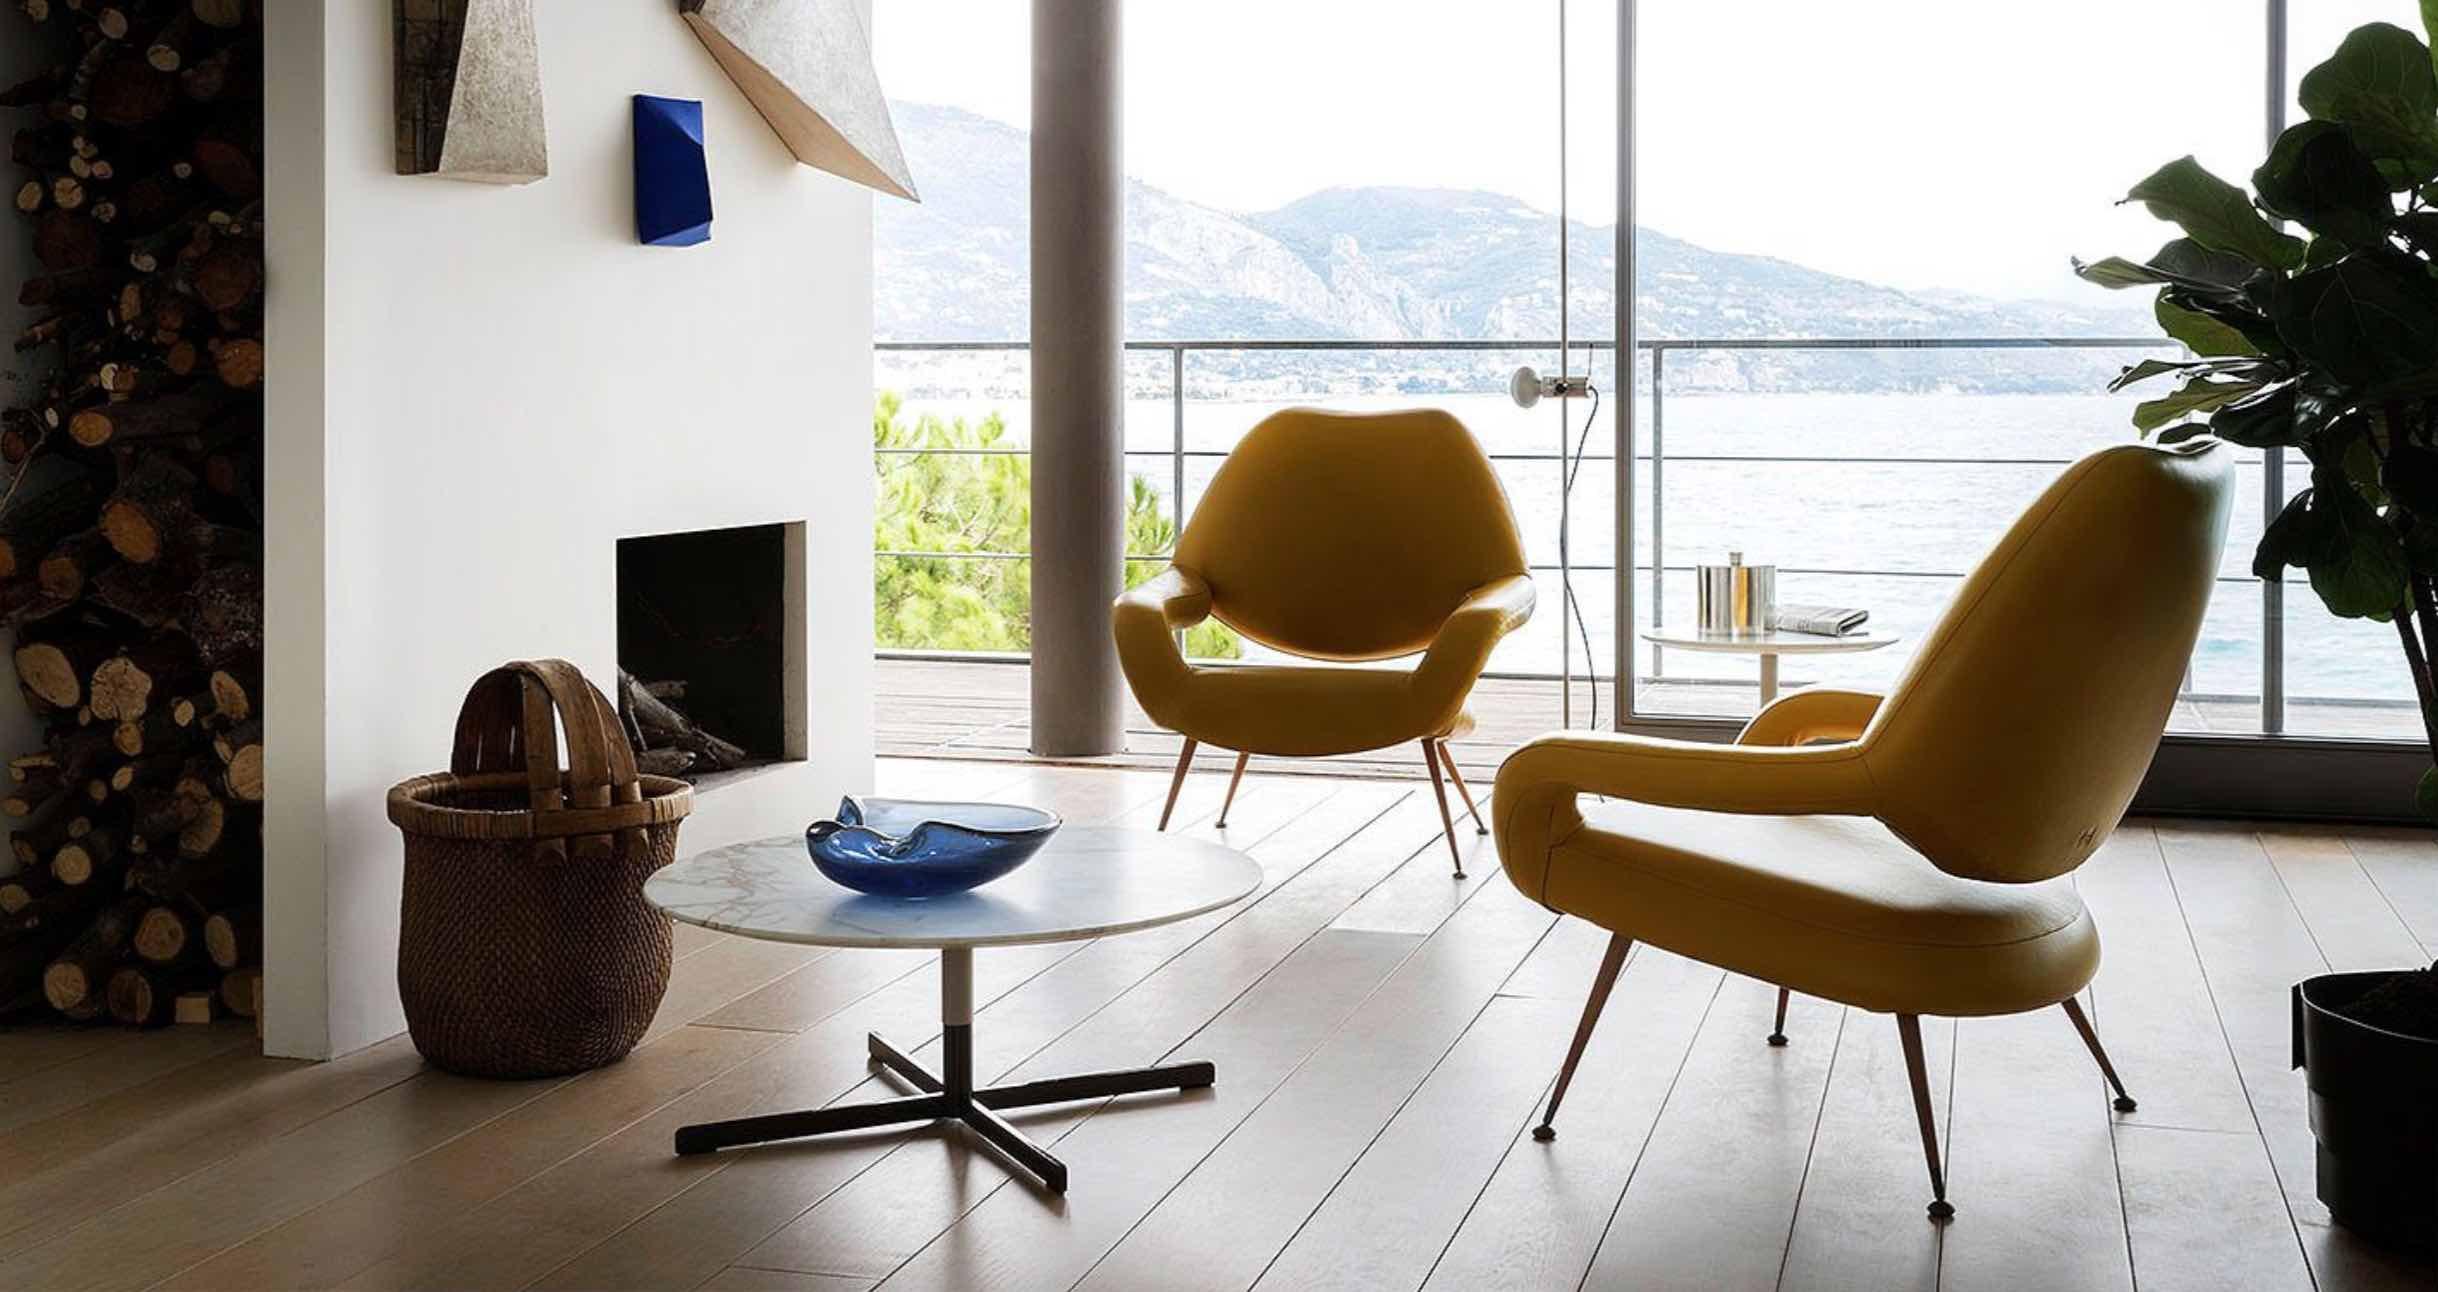 DU 55 | design- Gastone Rinaldi | Poltrona Frau